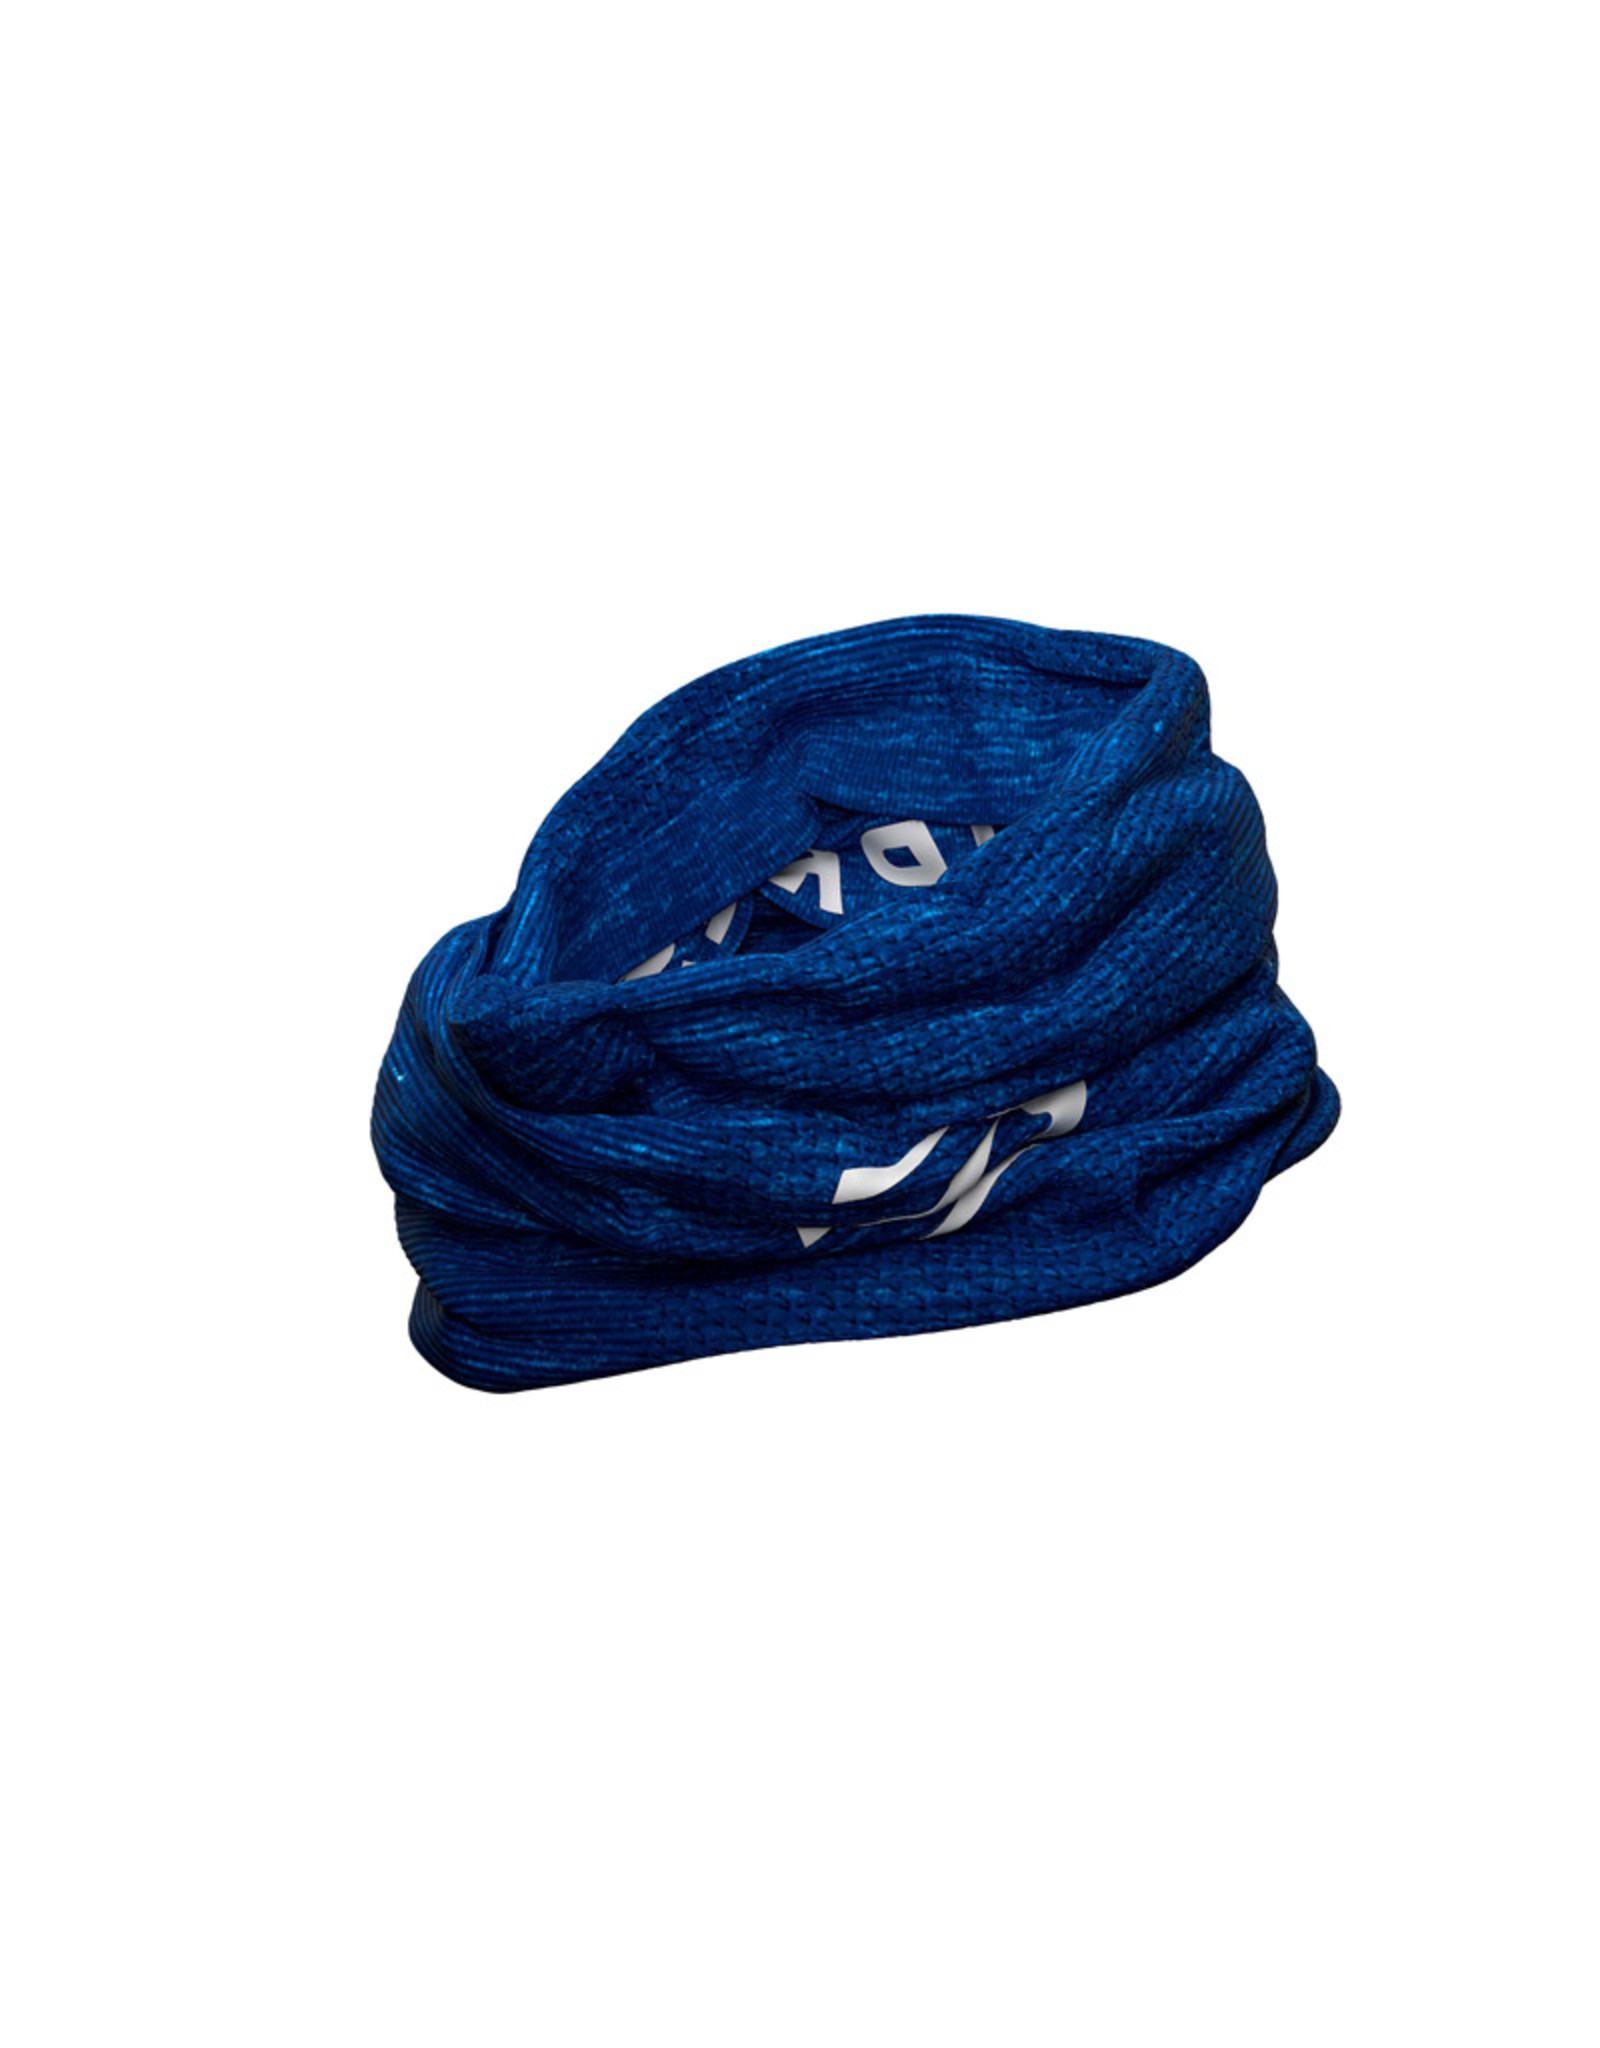 Compressport 3D Thermo Ultralight Headtube - Bleu